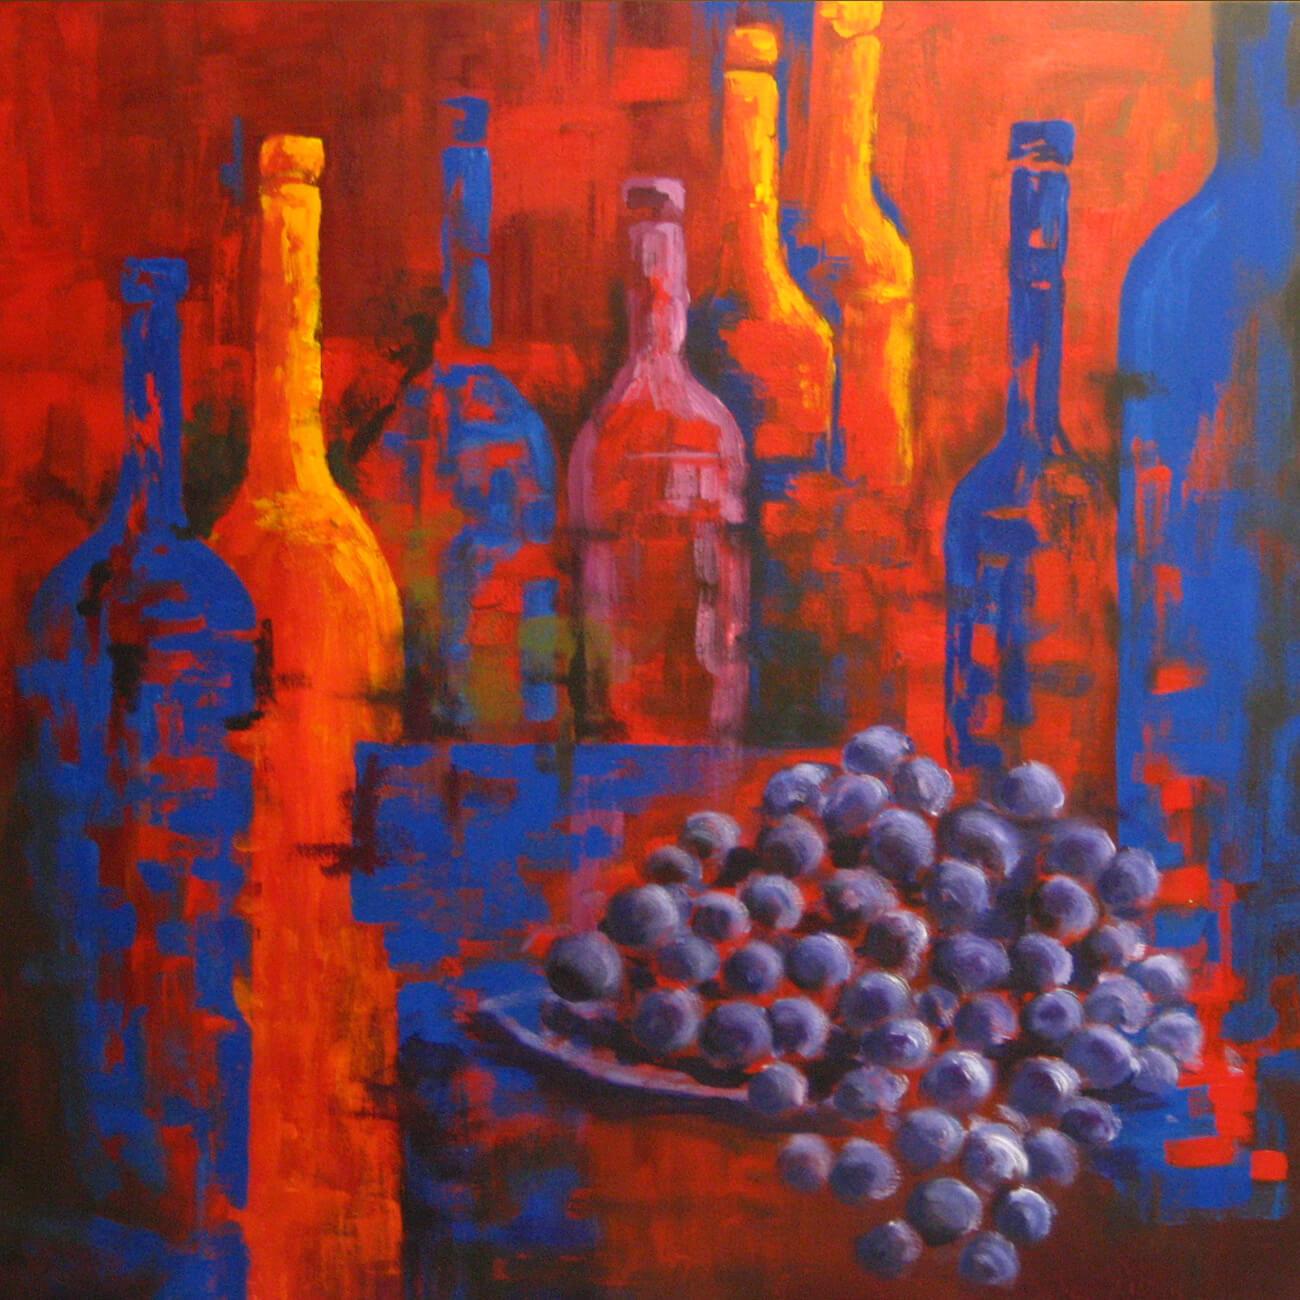 Botellas-en-rojo